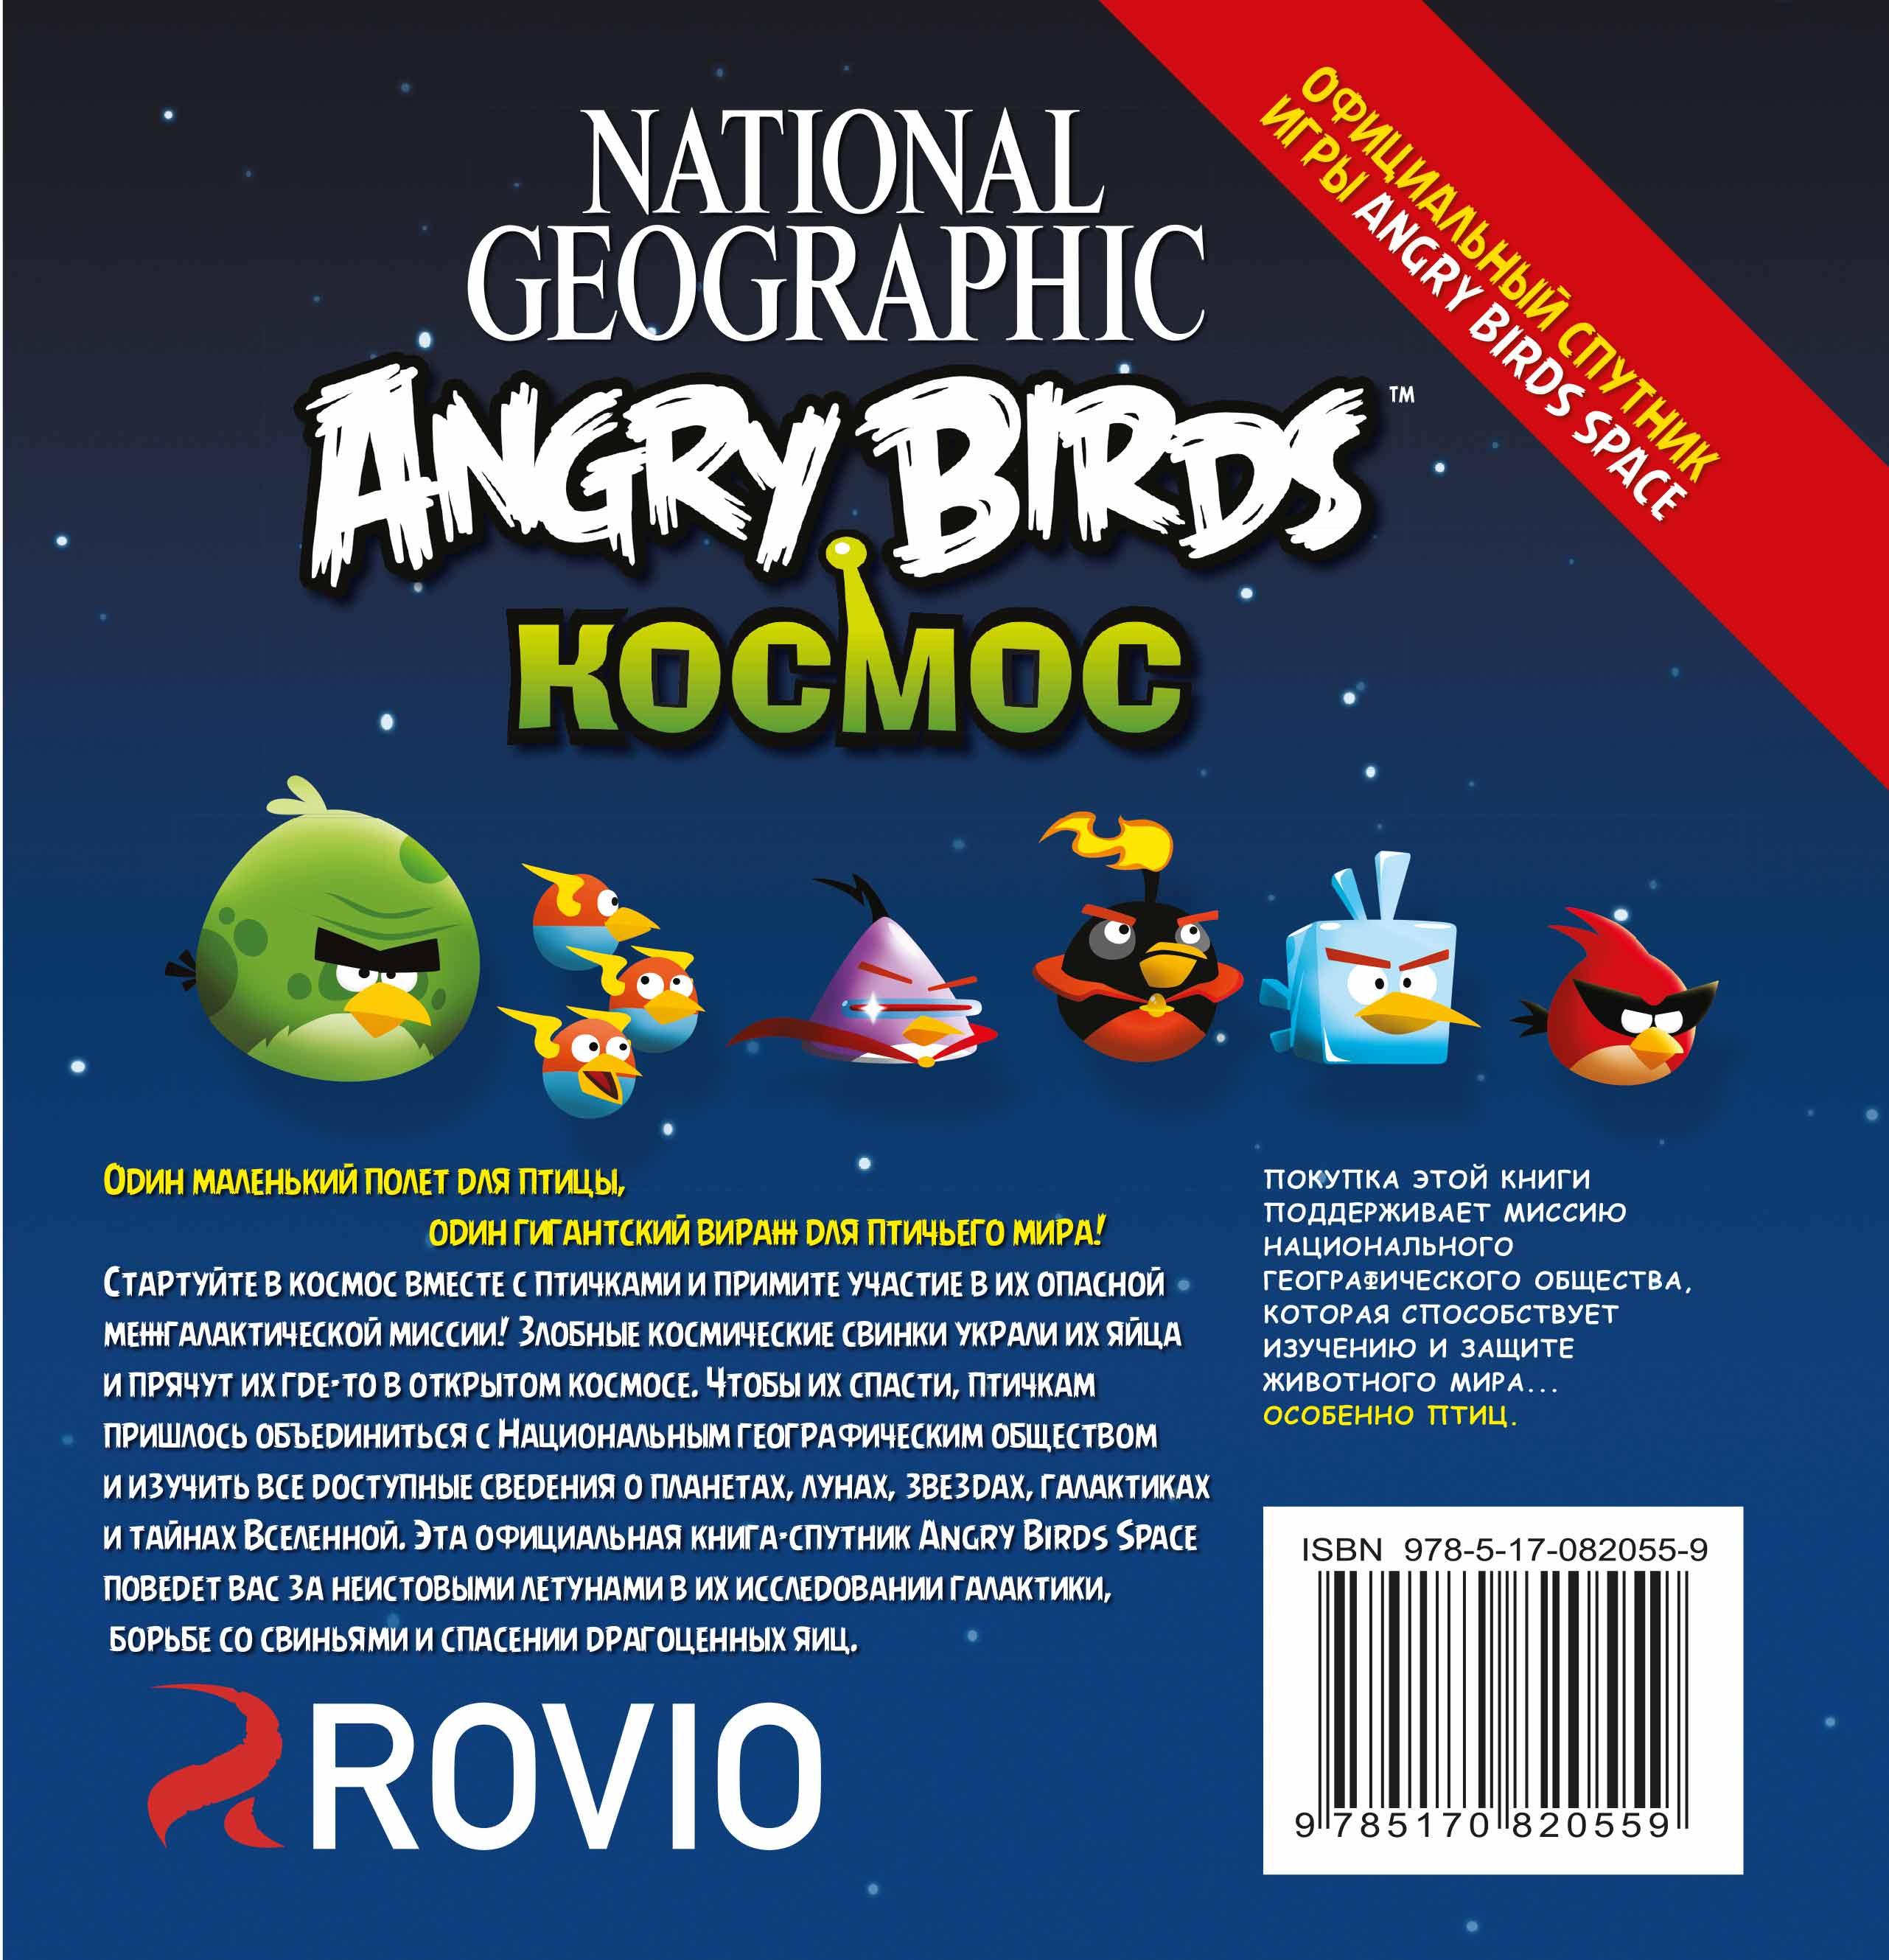 Книга Angry Birds. Космос. Эми Бриггс